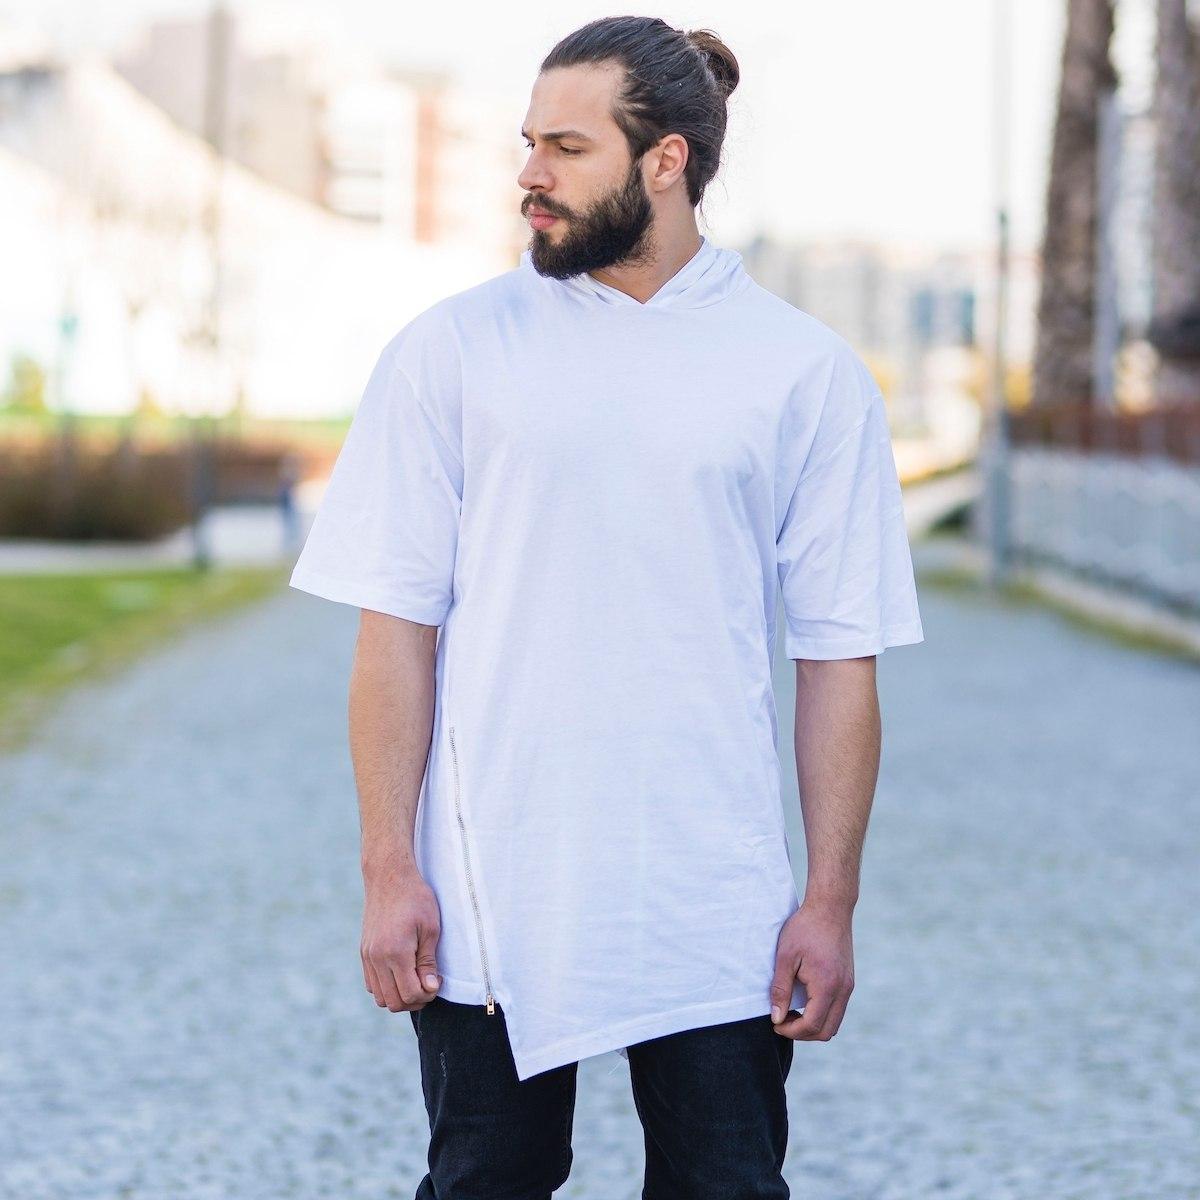 Men's Oversize Zipped T-Shirt In White